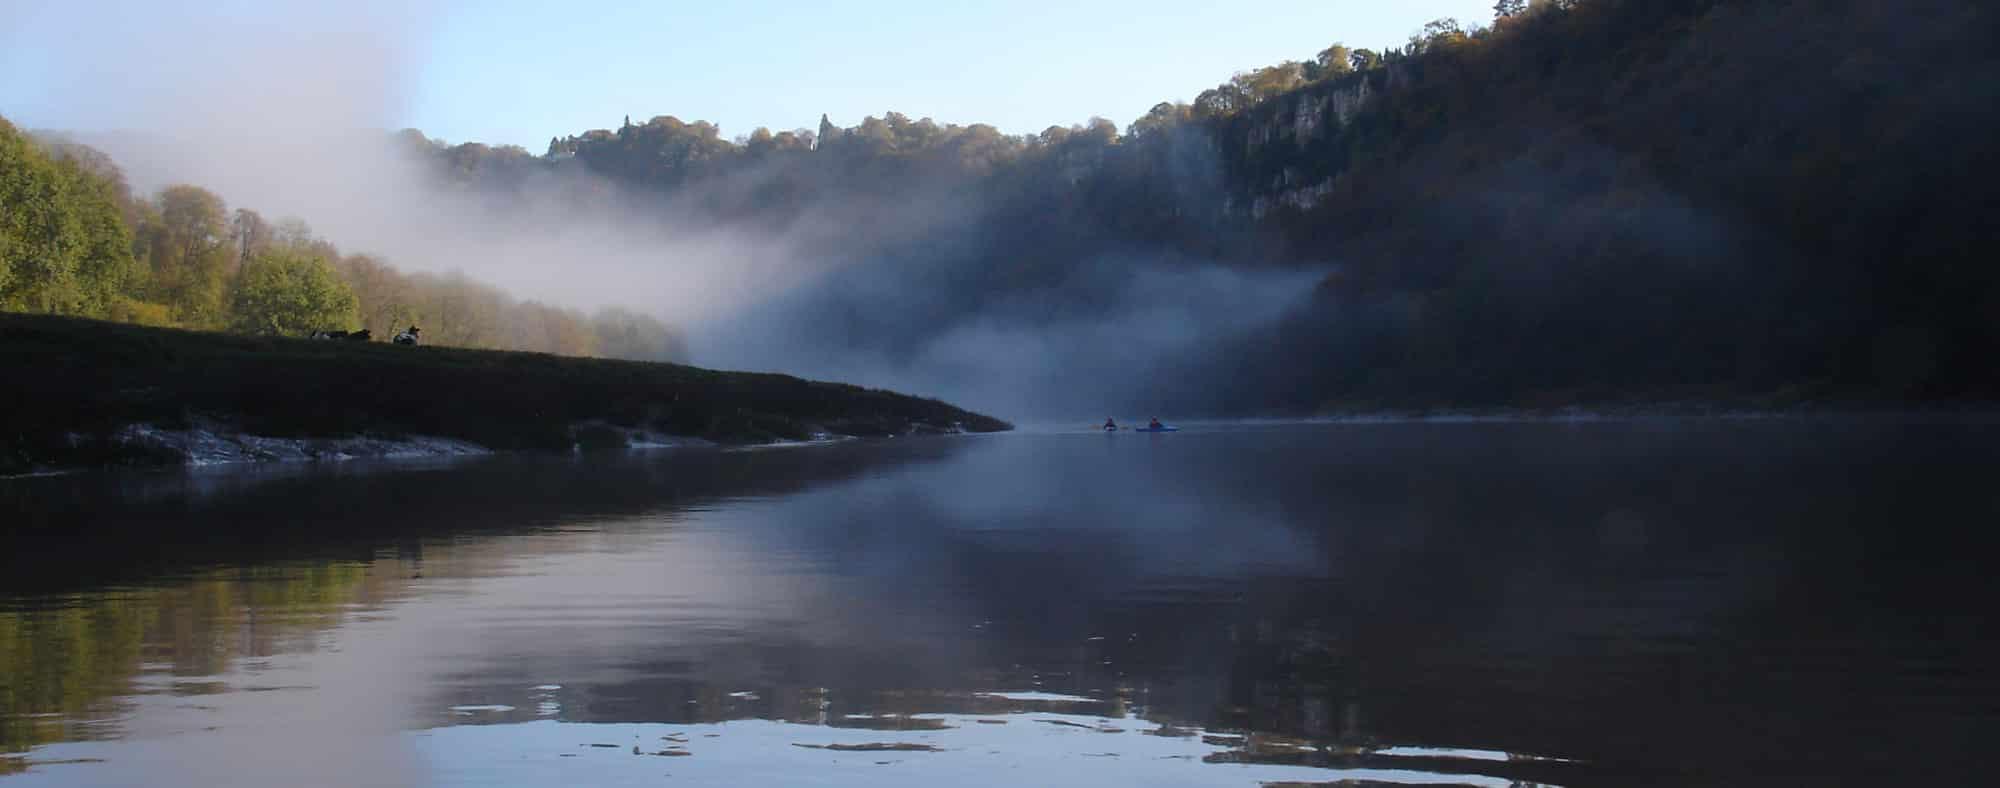 River Wye Herefordshire